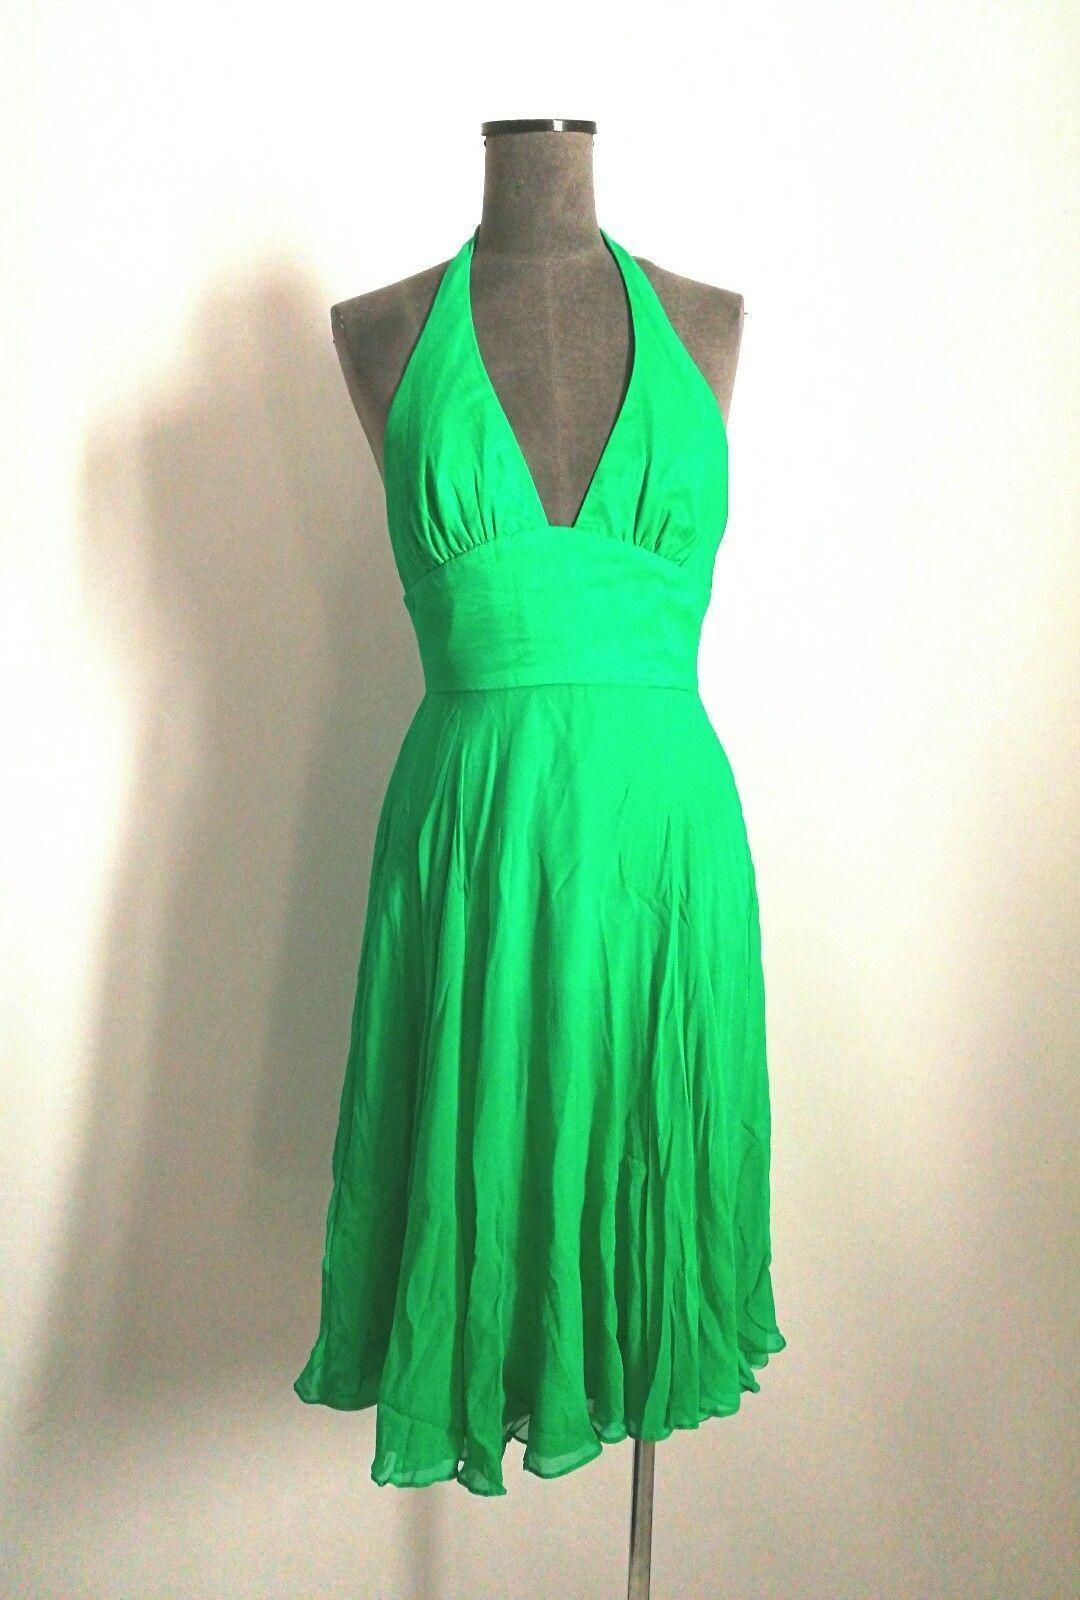 ALEX PERRY  Stunning Vibrant Emerald Green Silk Halter Dress Sz 2 US   6 AU